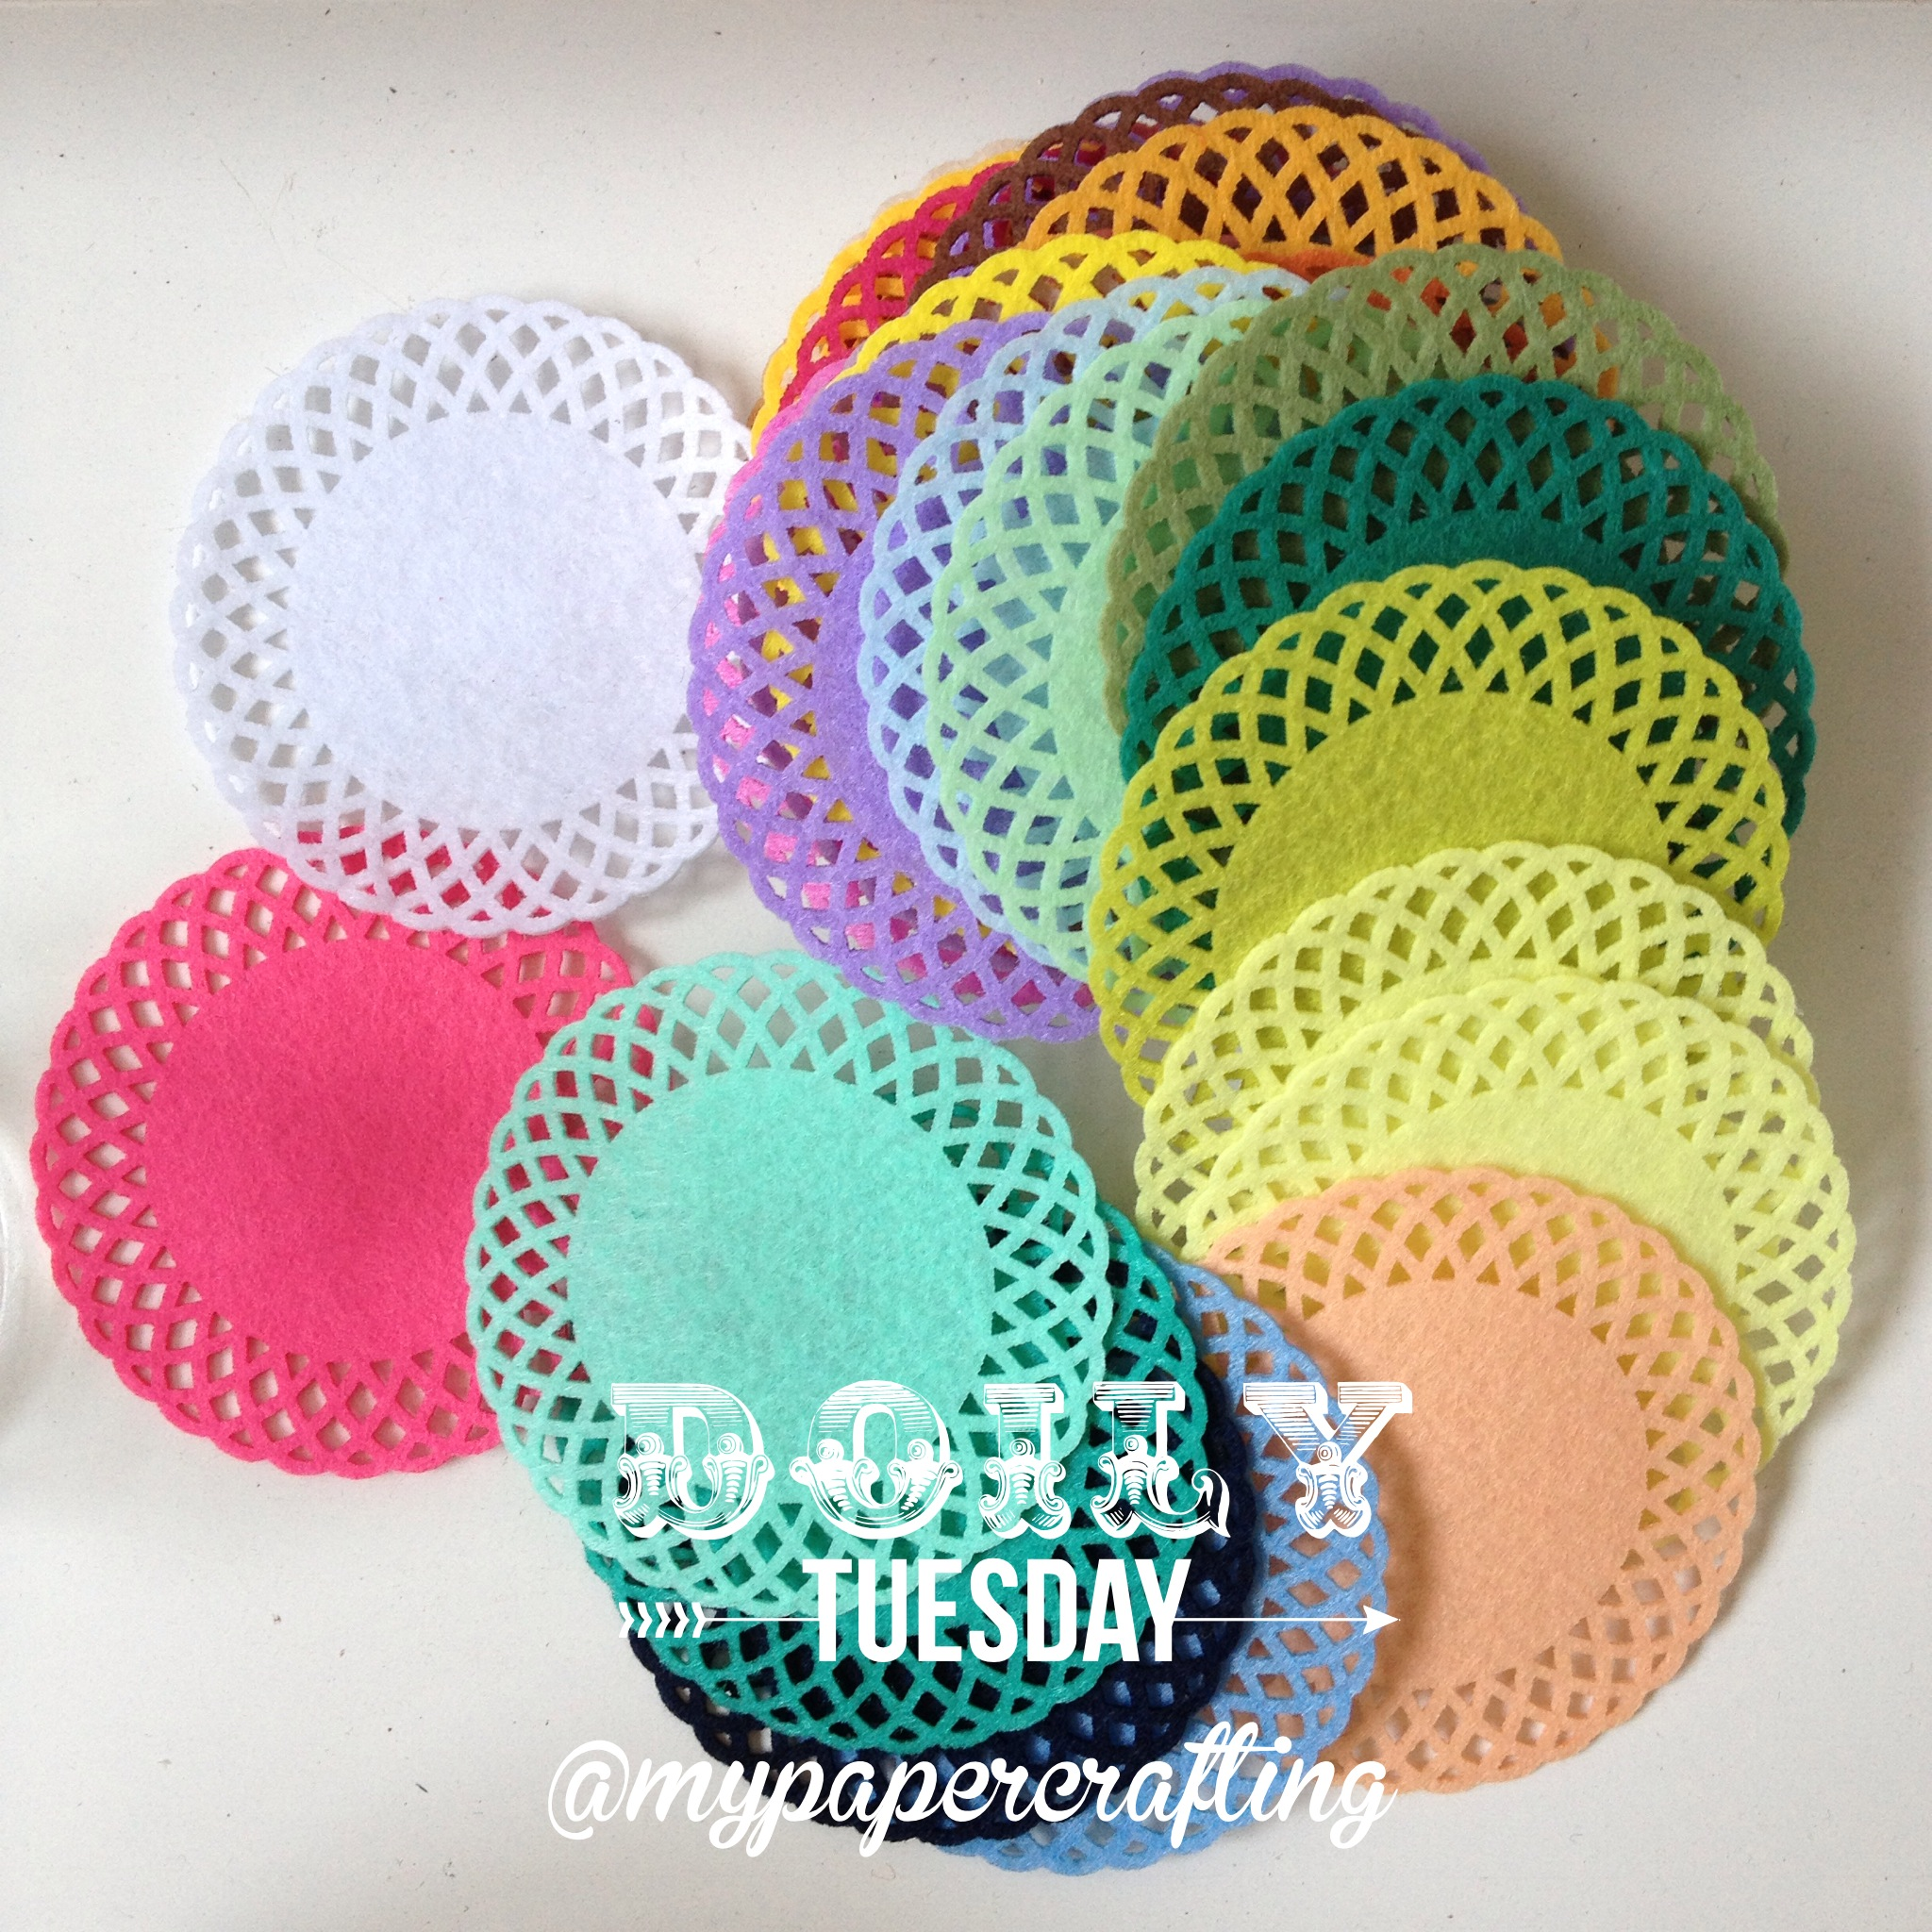 How to make scrapbook decorations - Colorful Felt Doily Design 1